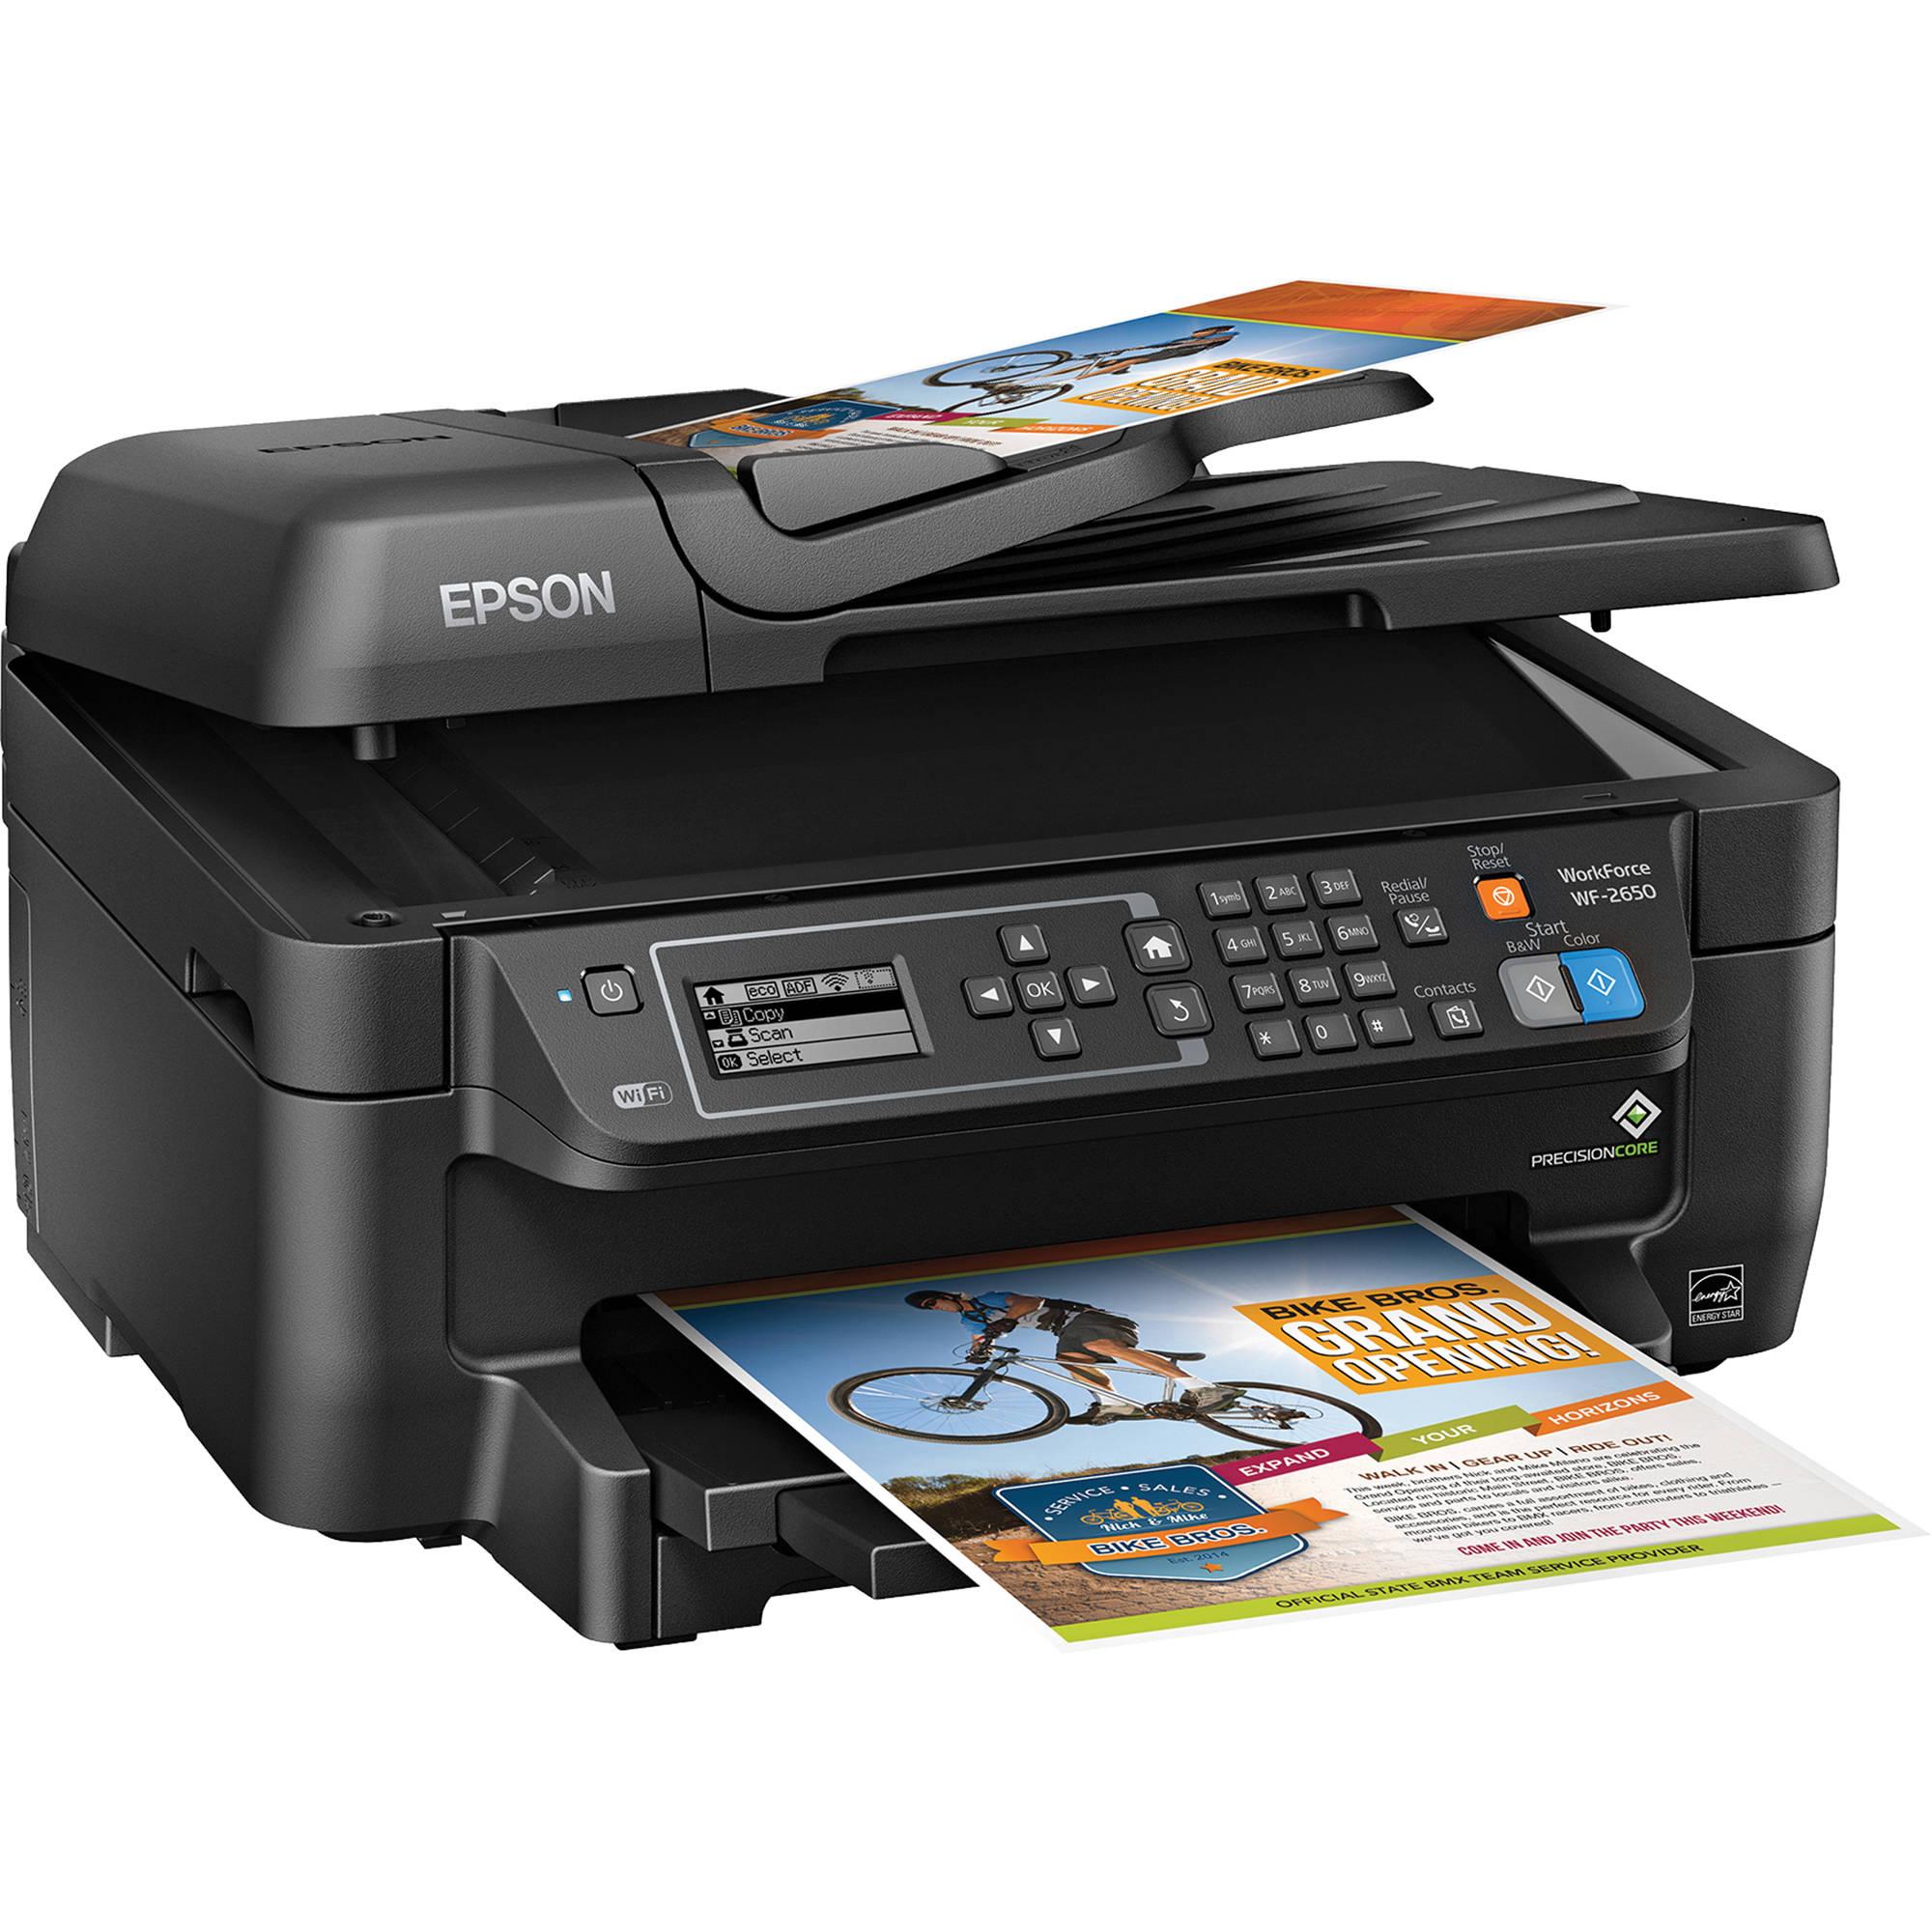 Epson WorkForce WF-2650 All-In-One Inkjet Printer ...